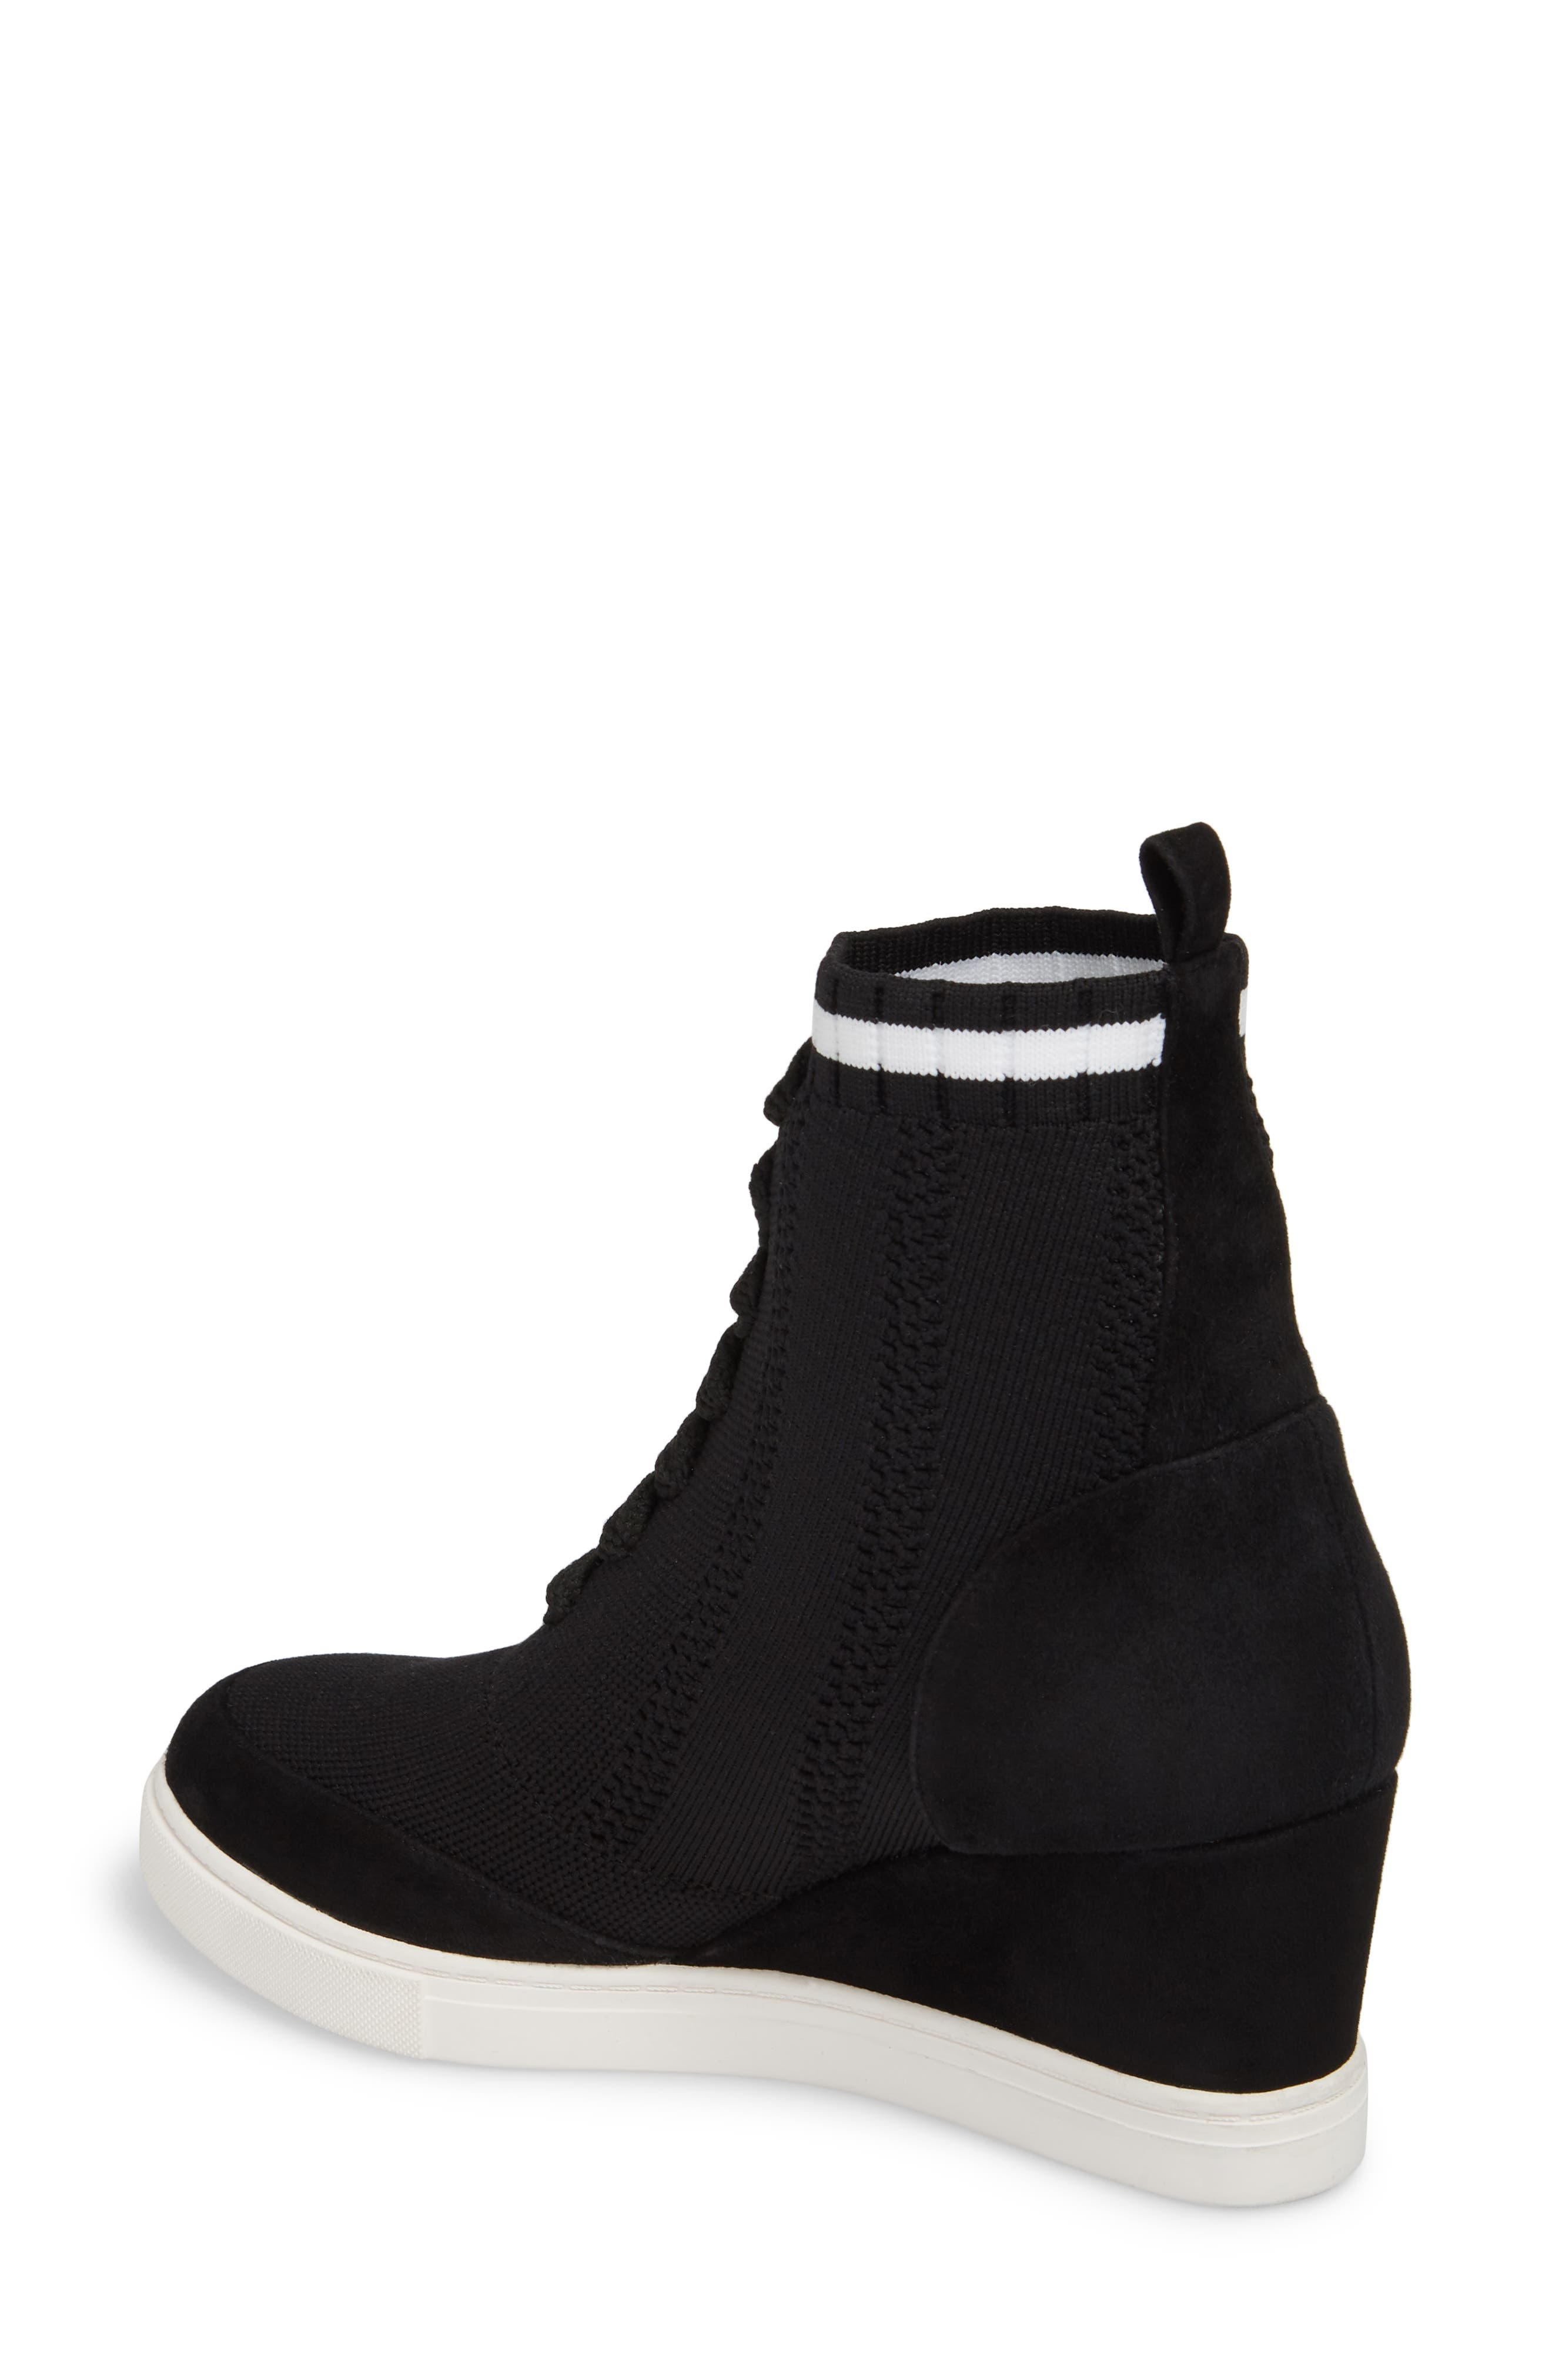 Fabiana Wedge Sneaker,                             Alternate thumbnail 2, color,                             BLACK SUEDE